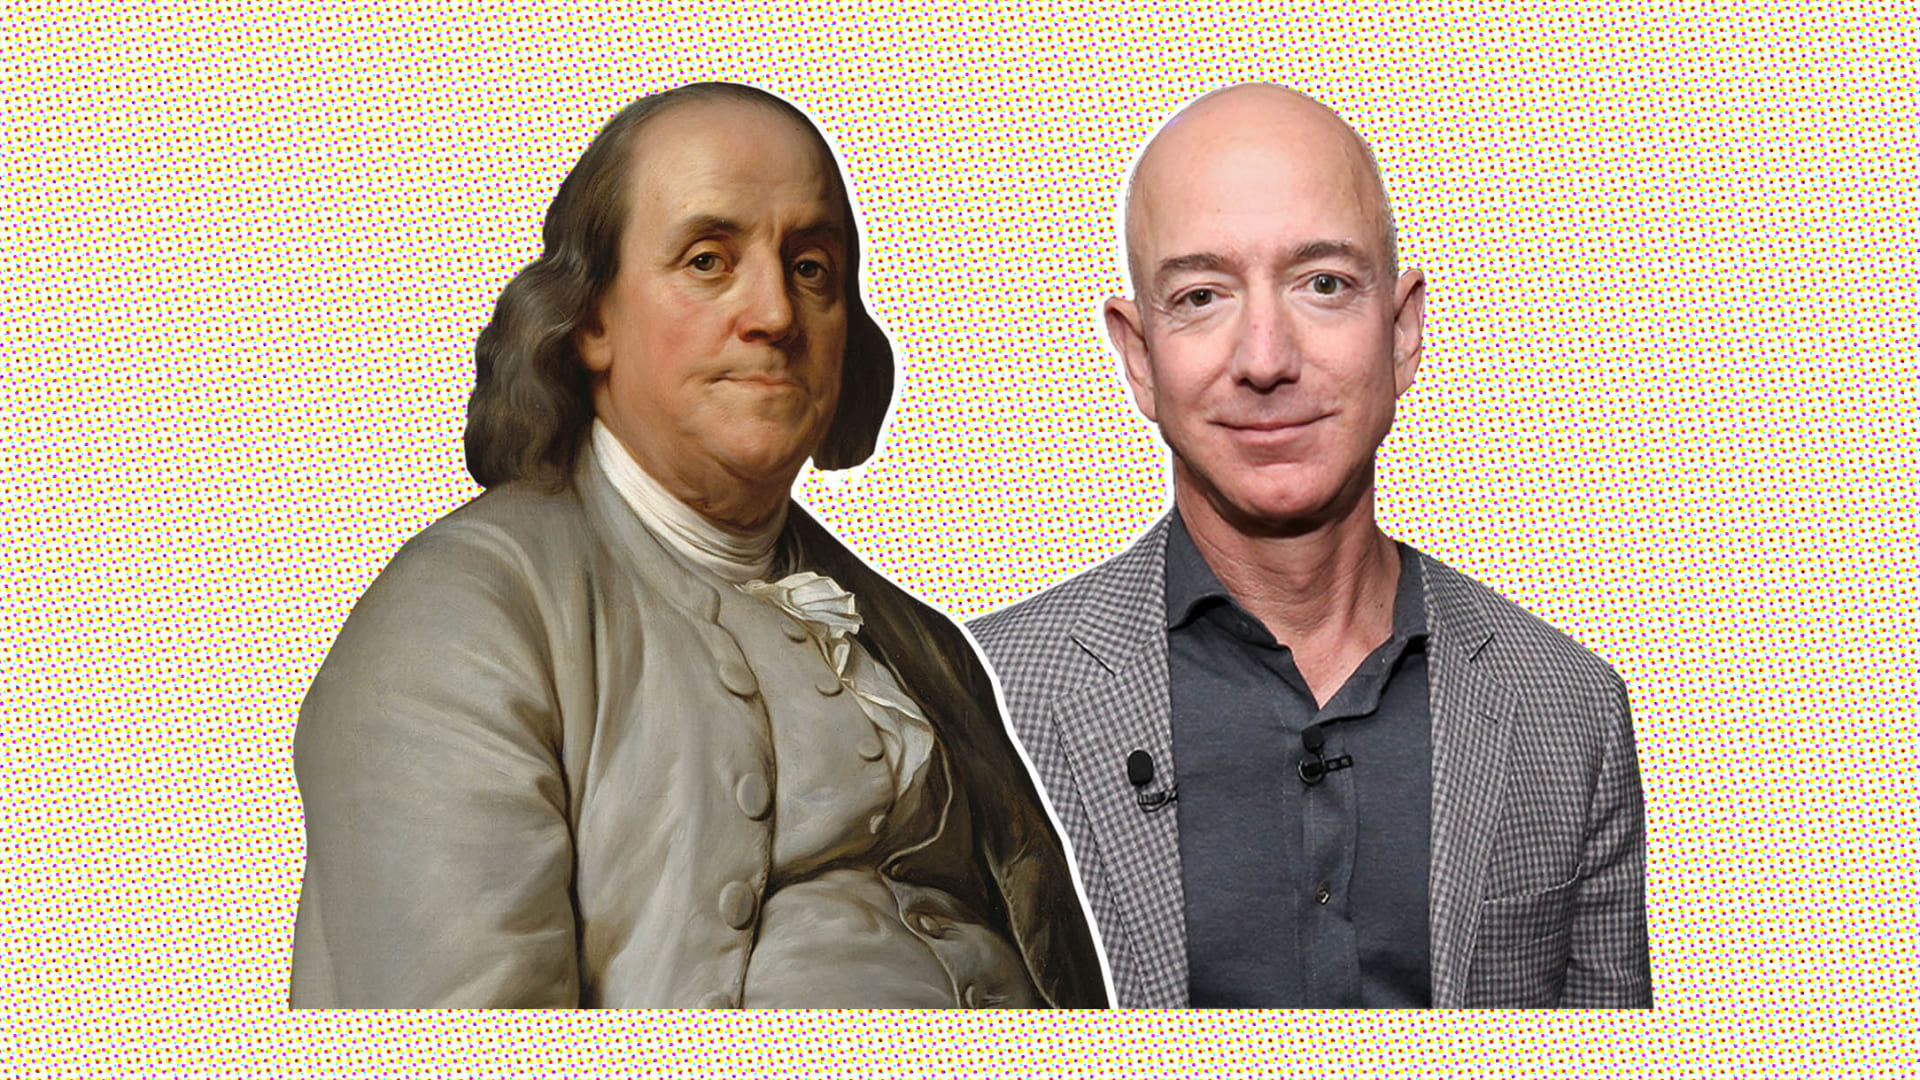 Benjamin Franklin and Jeff Bezos.